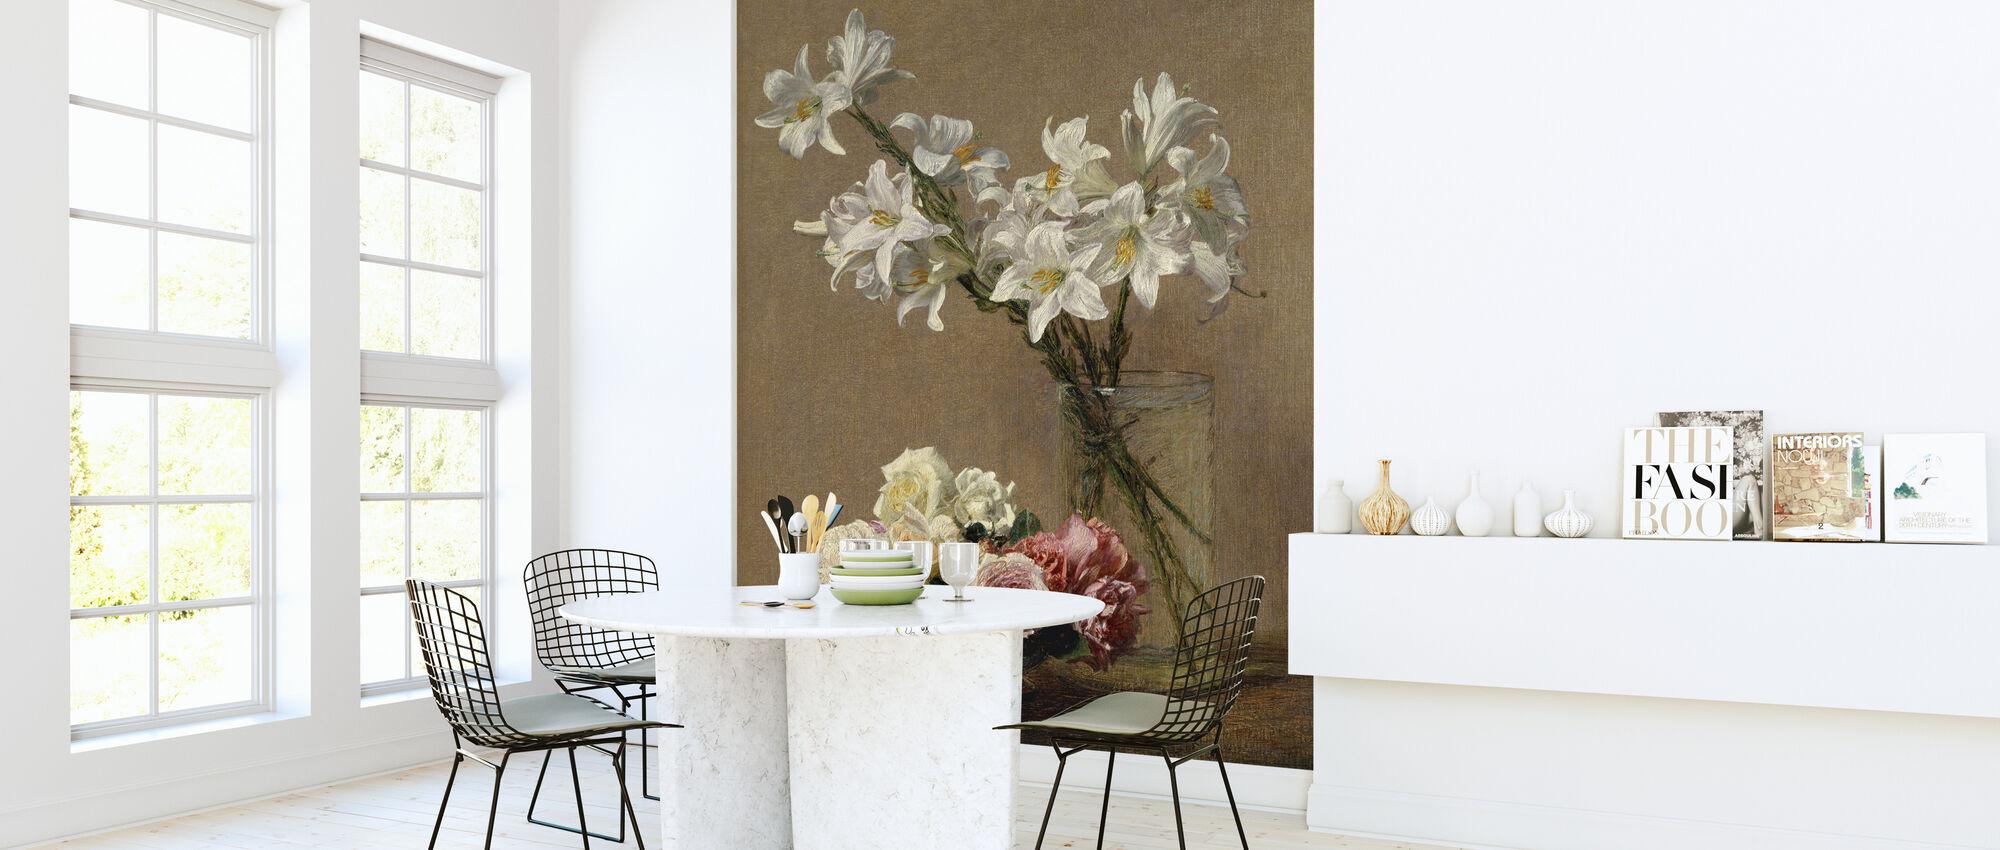 Roses and Lilies - Henri Fantin-Latour - Wallpaper - Kitchen